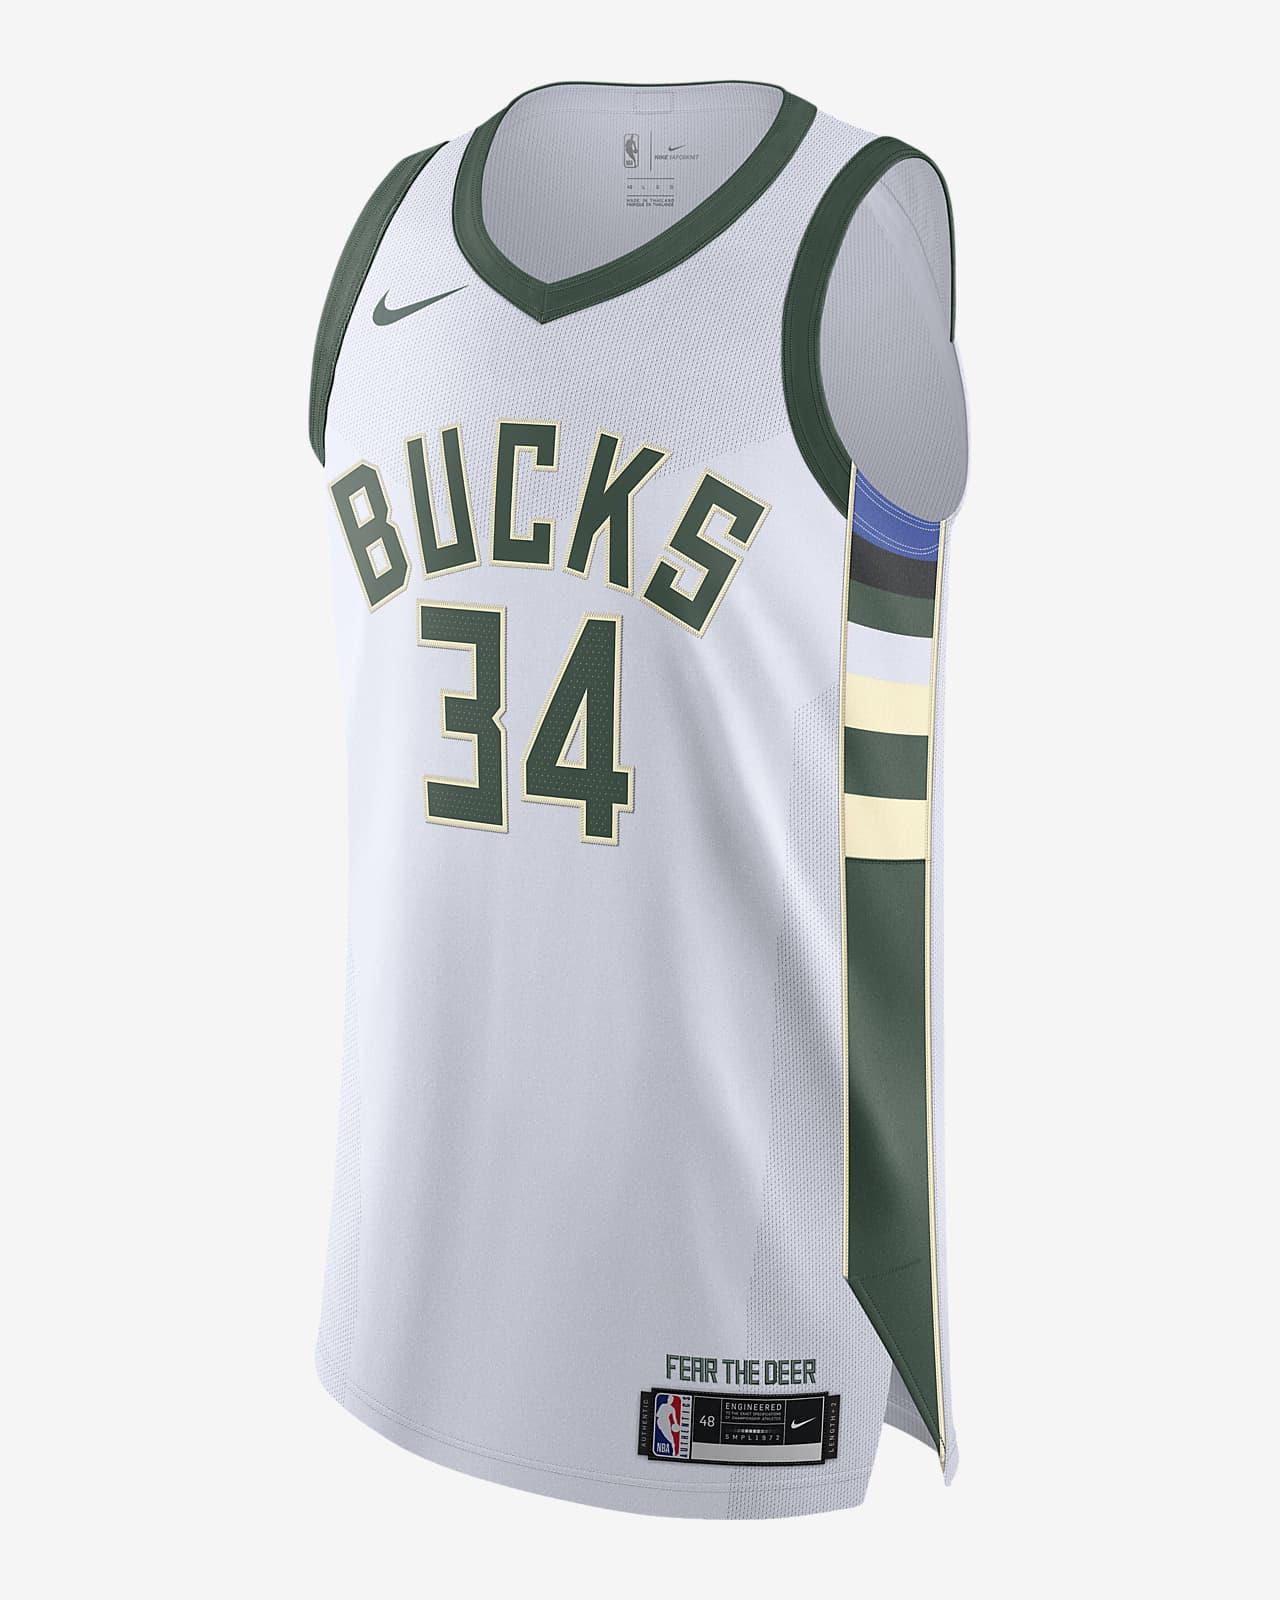 Giannis Antetokounmpo Bucks Association Edition 2020 Nike NBA Authentic Jersey